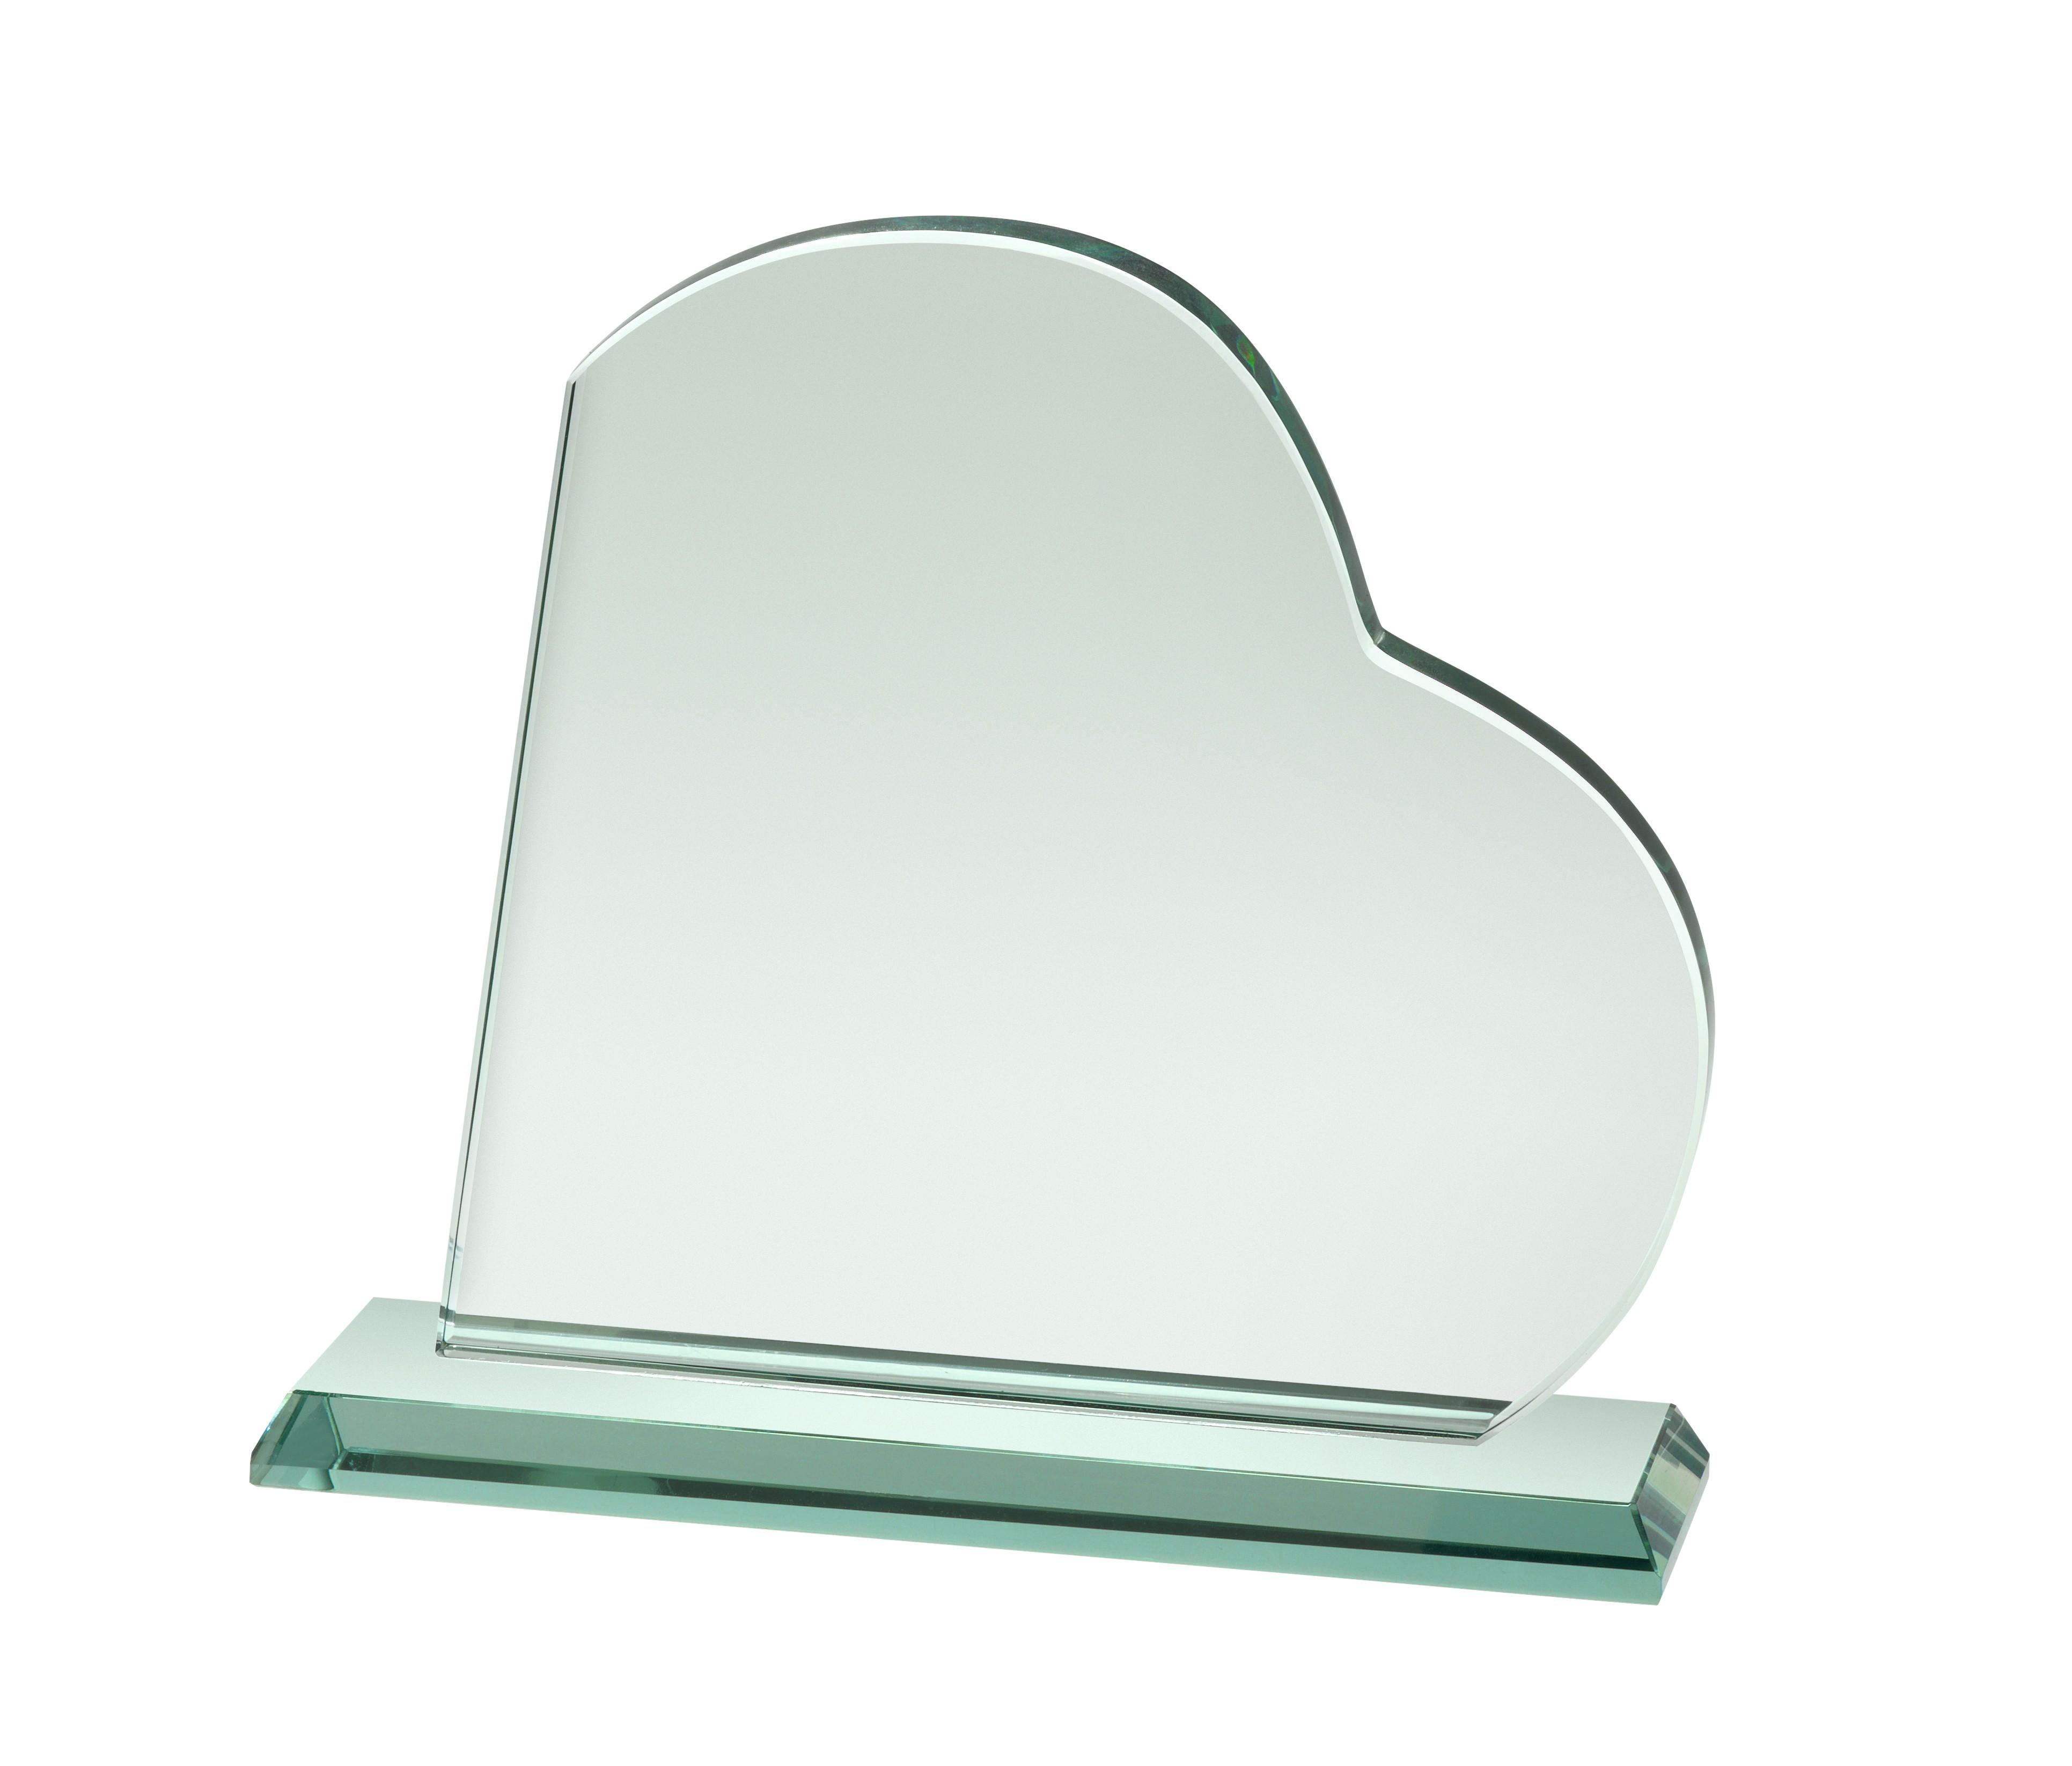 12mm Thick Jade Glass Heart Award